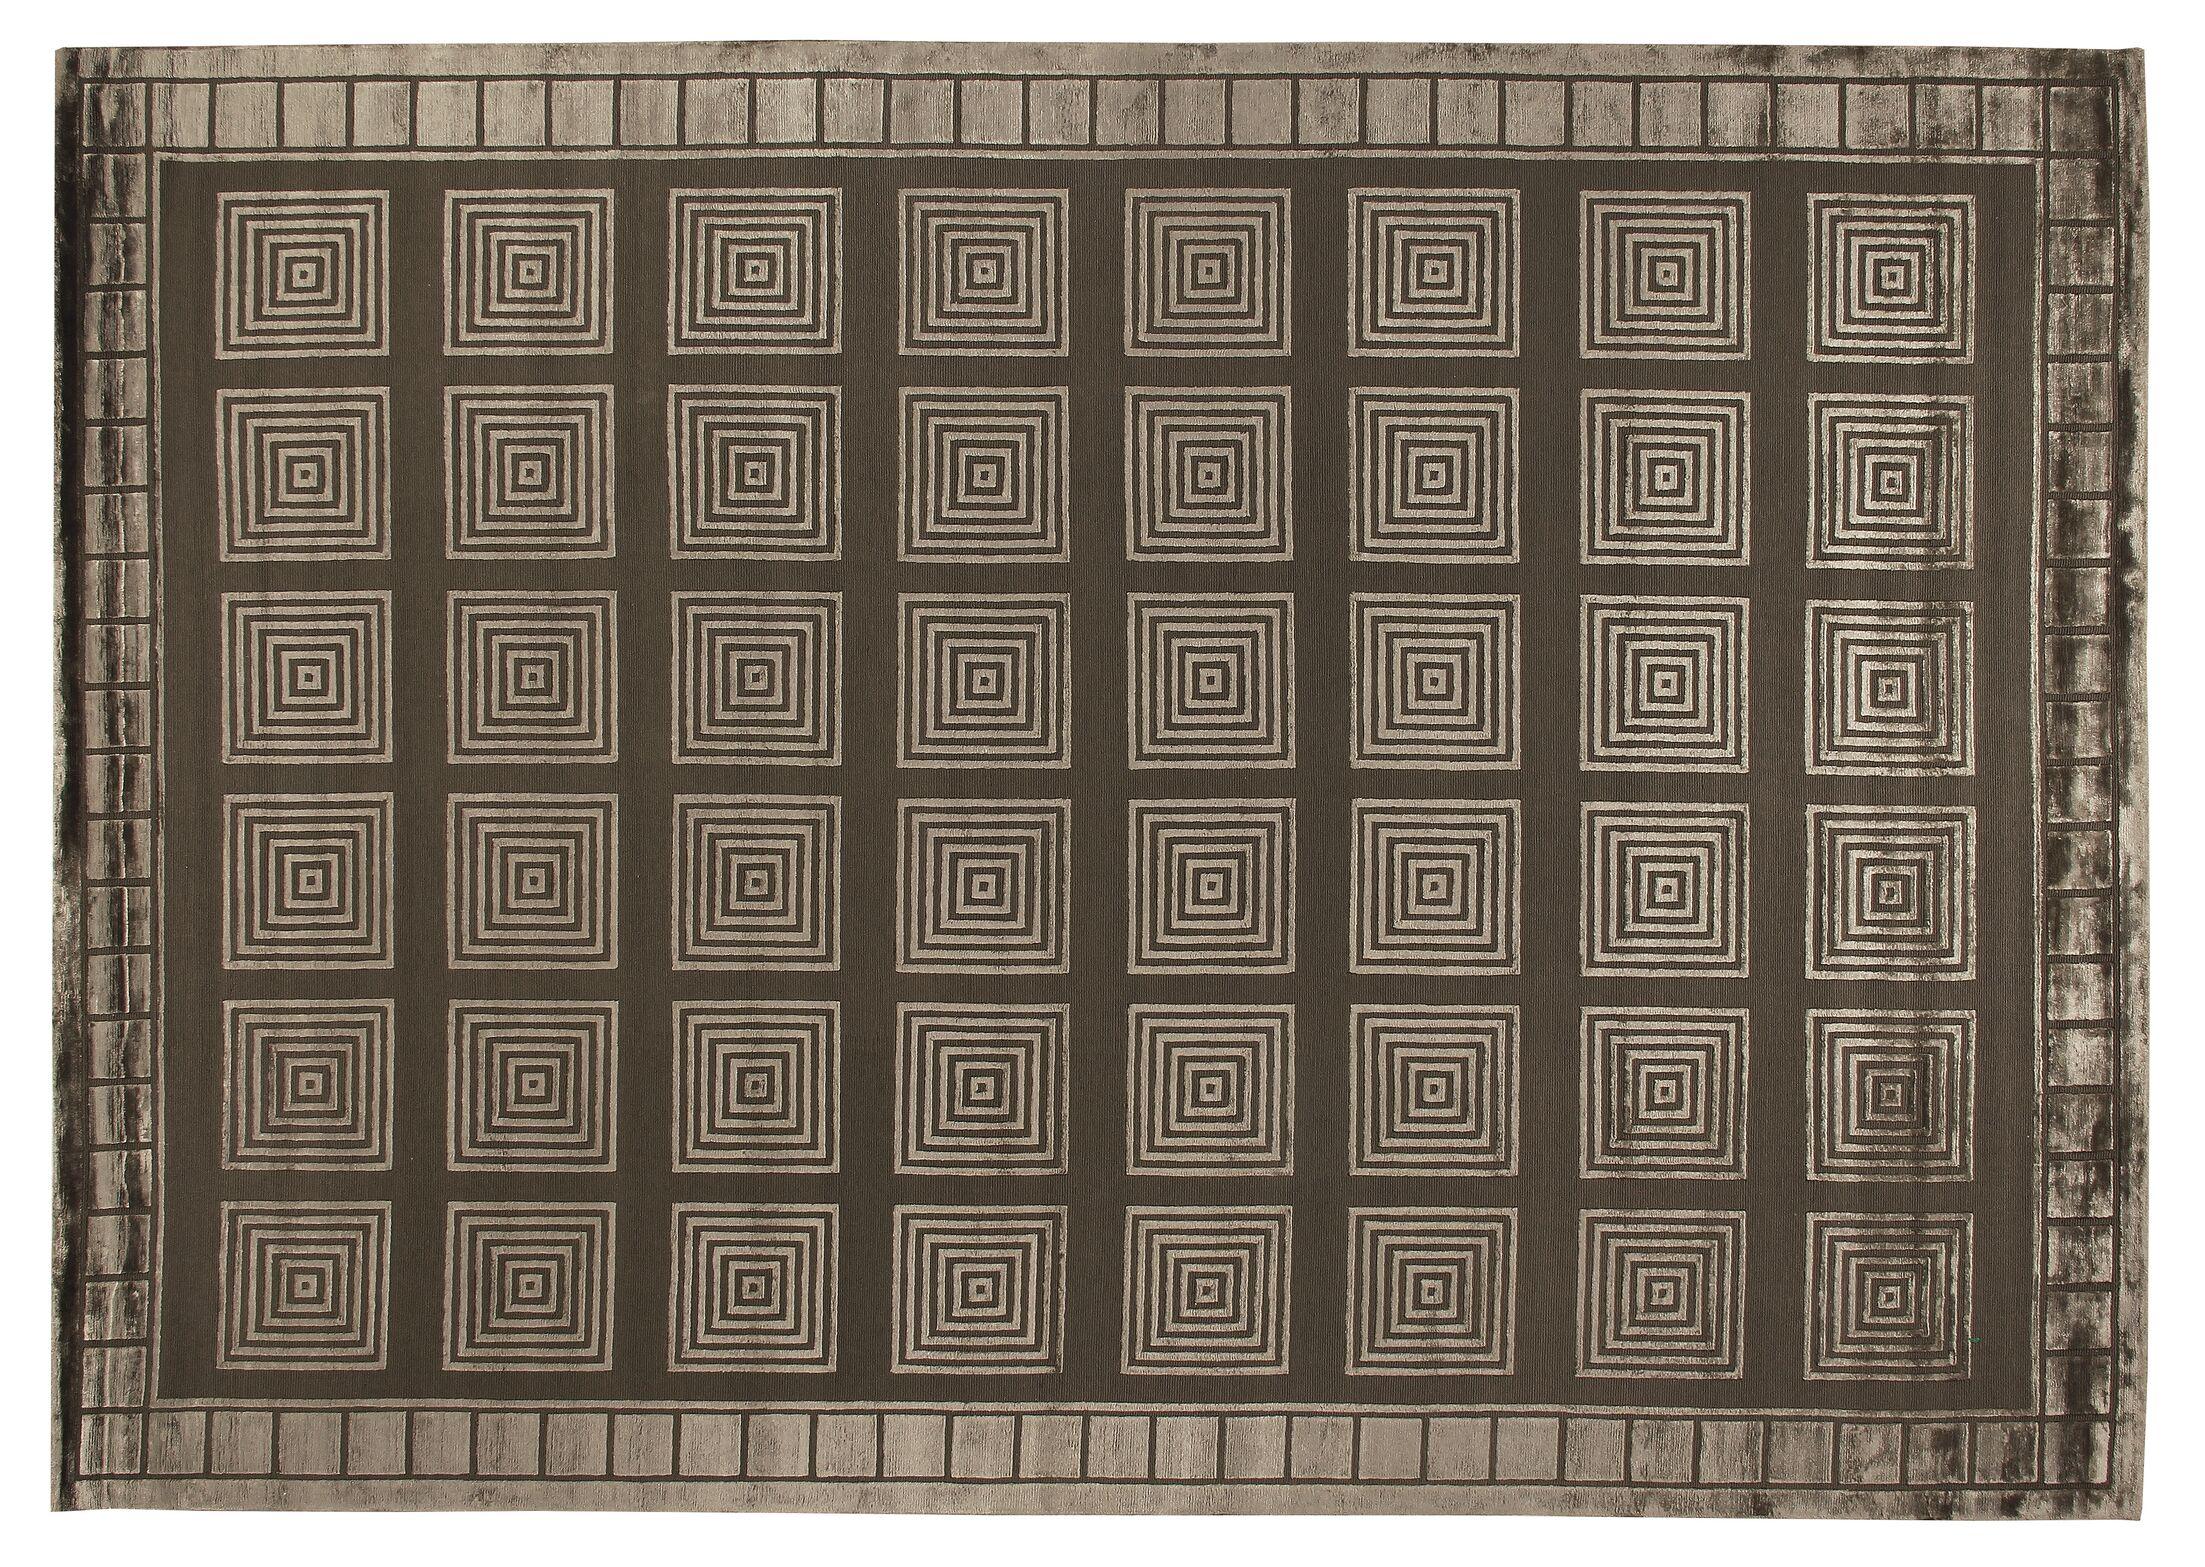 Metro Hand Woven Khaki Area Rug Rug Size: Rectangle 8' x 10'